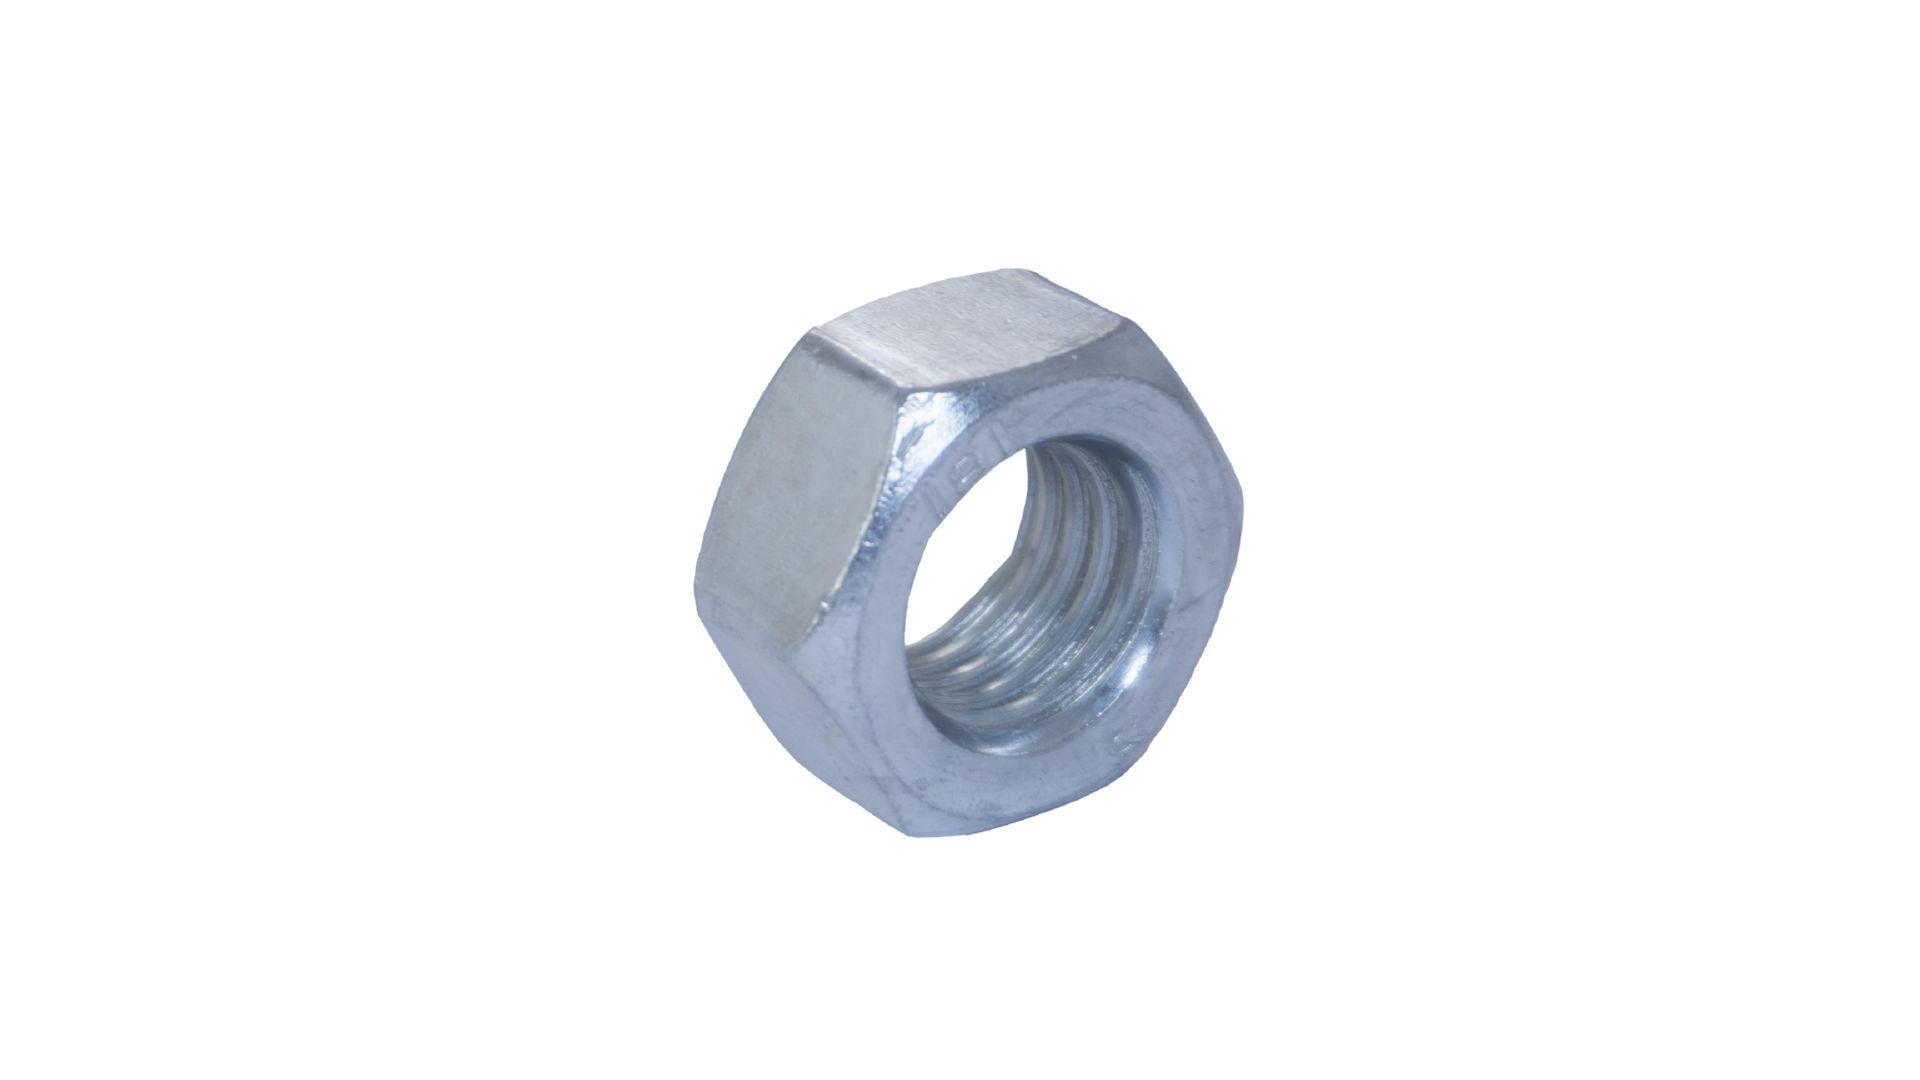 Гайка шестигранная Apro - М12 DIN 934 (25 шт.) 3